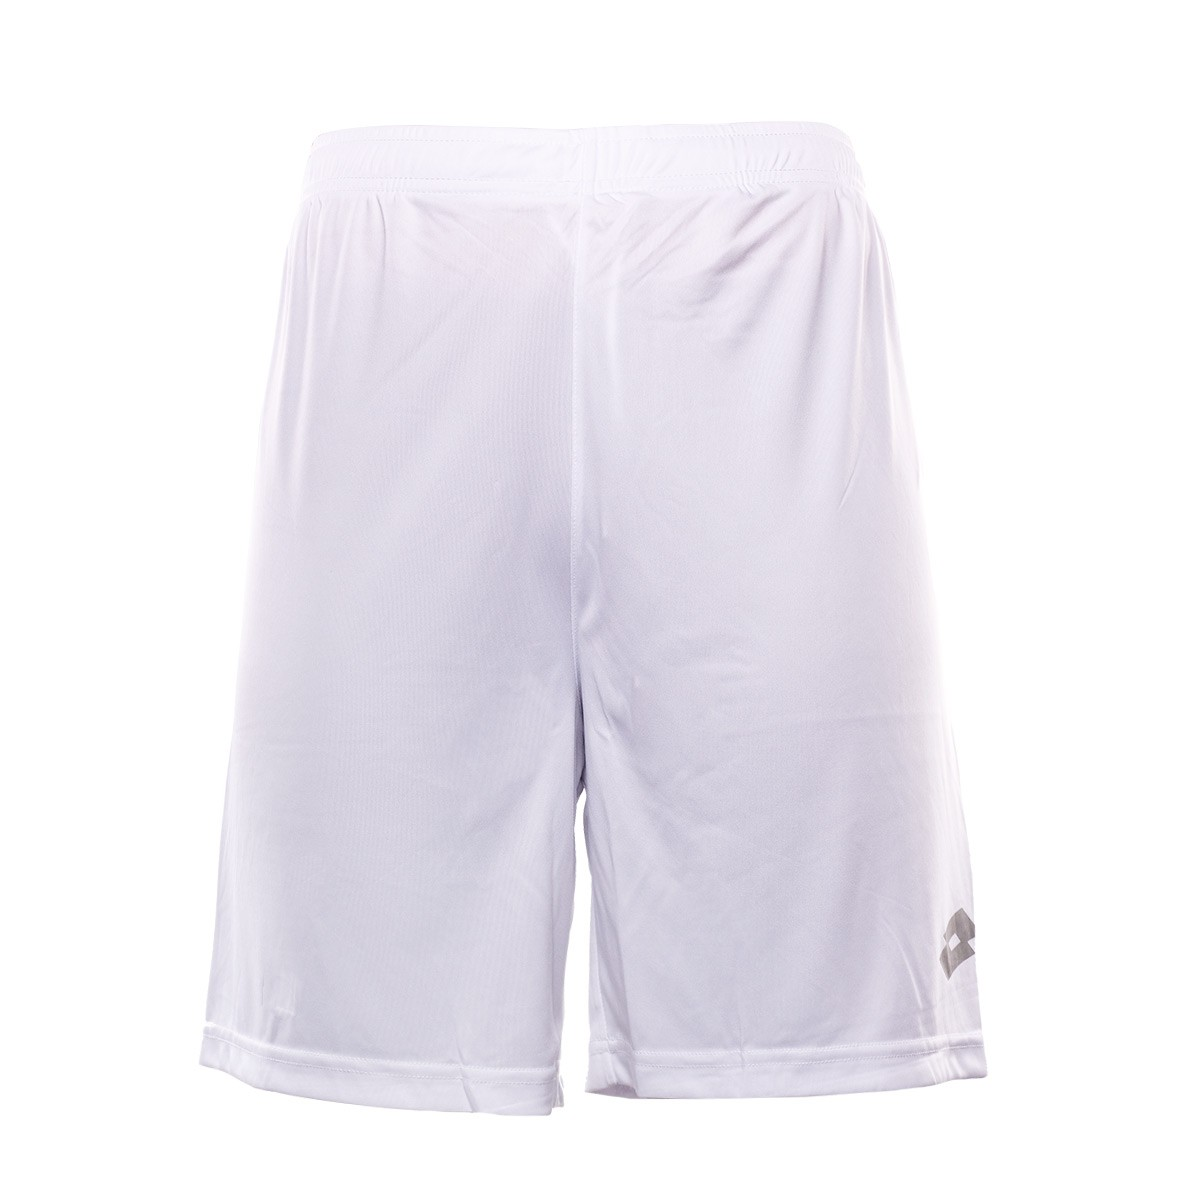 nuevo concepto 19a0c 9efea Pantalón corto Delta White